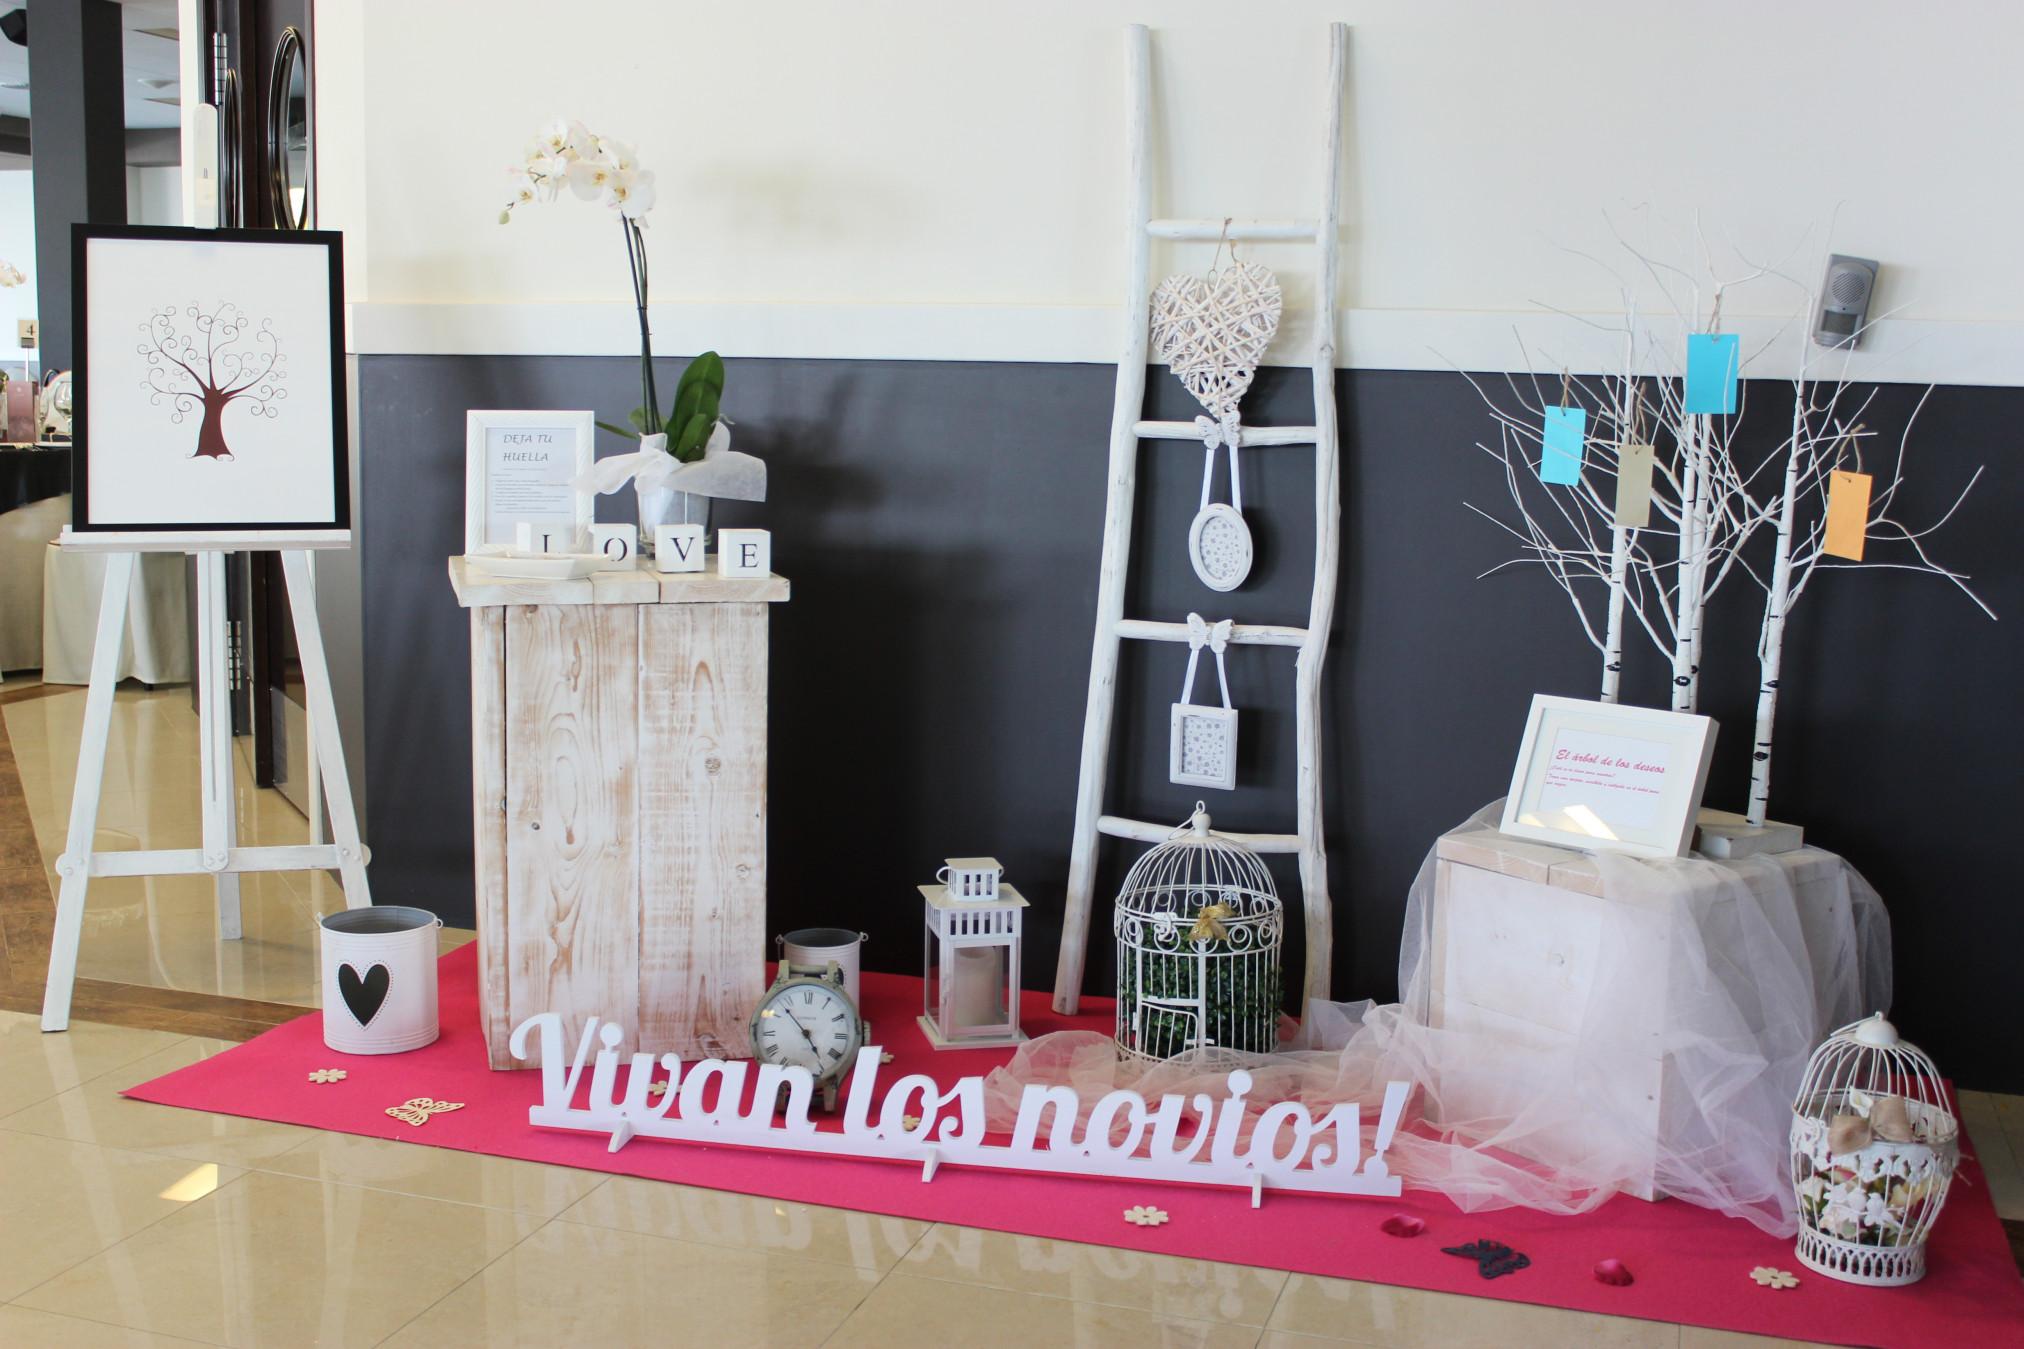 detalles-vuestra-boda-larache-celebraciones